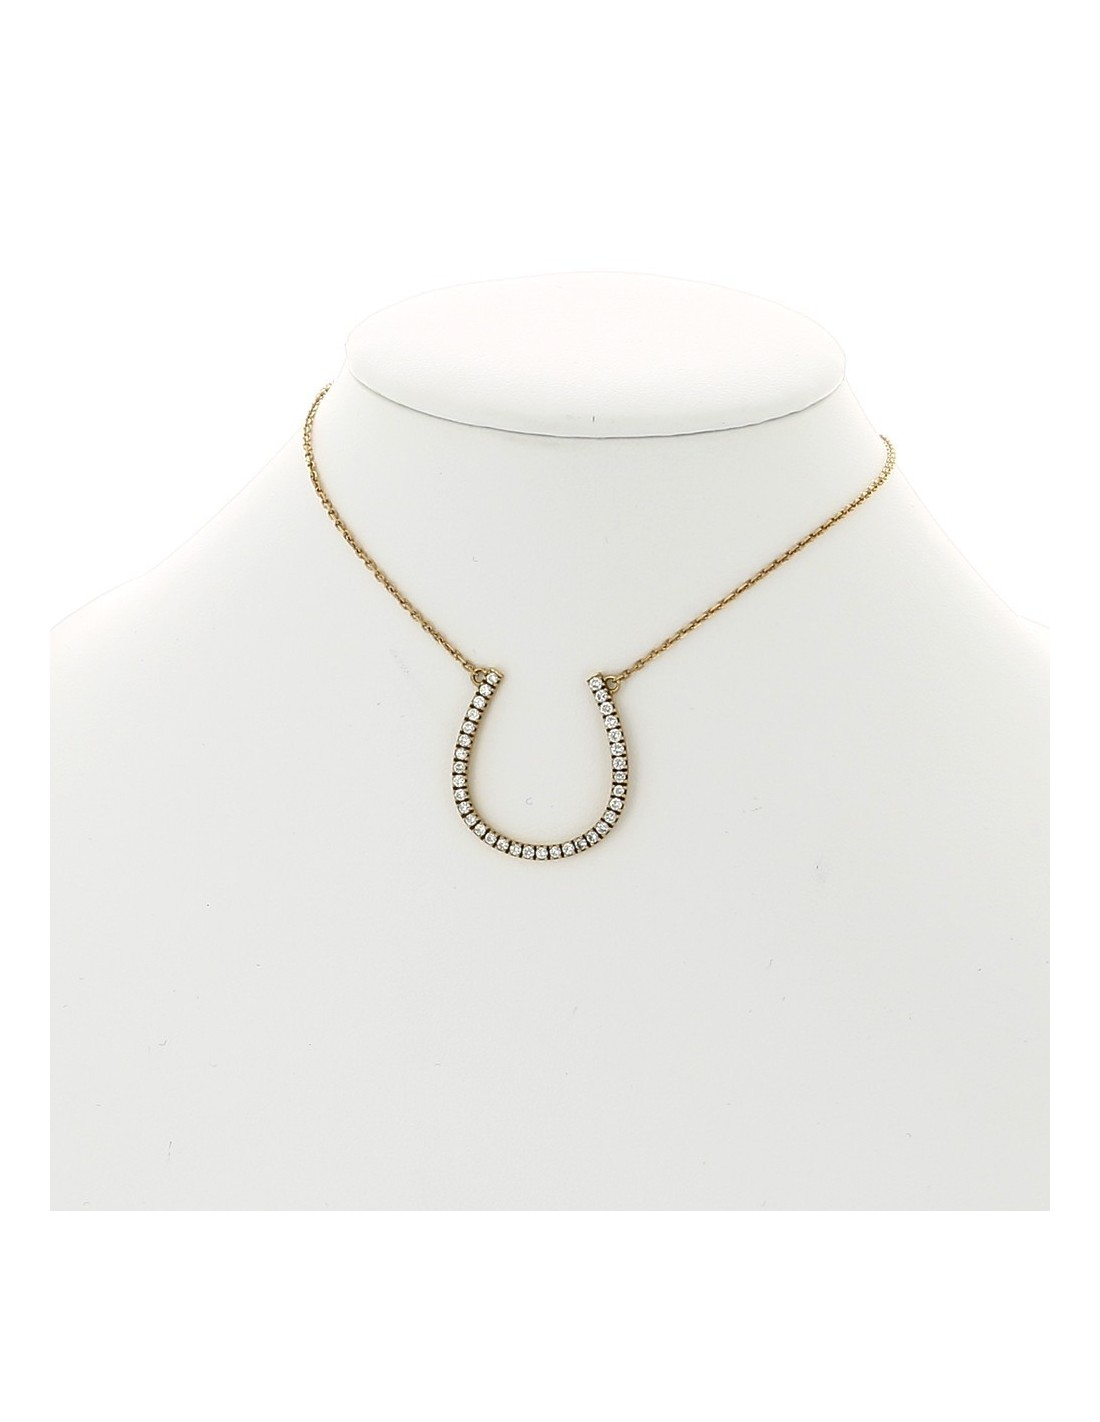 collier pendentif en or 18 carats motif fer cheval serti mini griffes diamants 0 57 carat. Black Bedroom Furniture Sets. Home Design Ideas